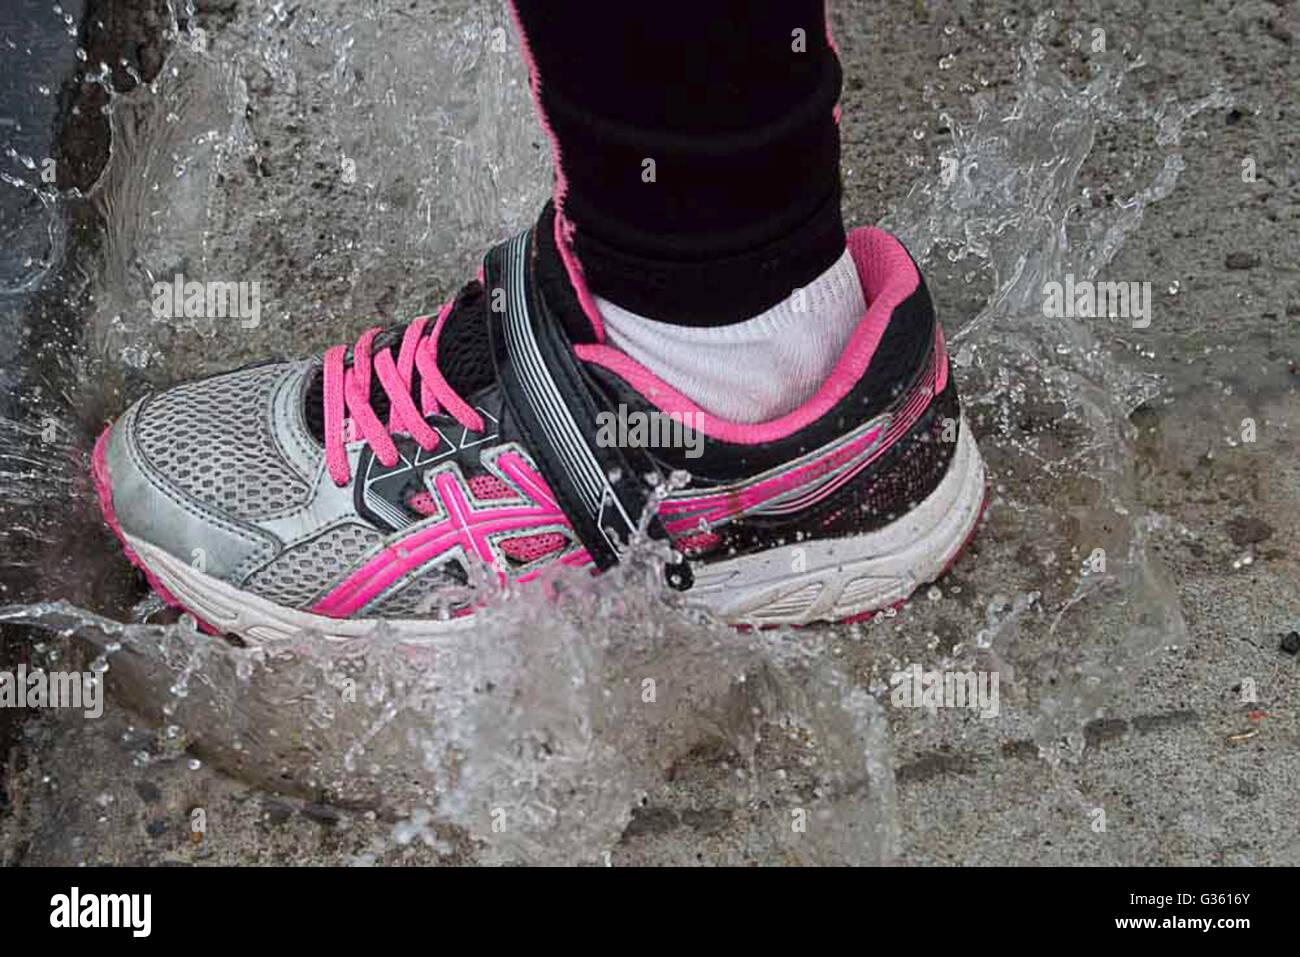 Calzado deportivo, zapatos, zapatillas de deporte, zapatos, corriendo a través de un charco Imagen De Stock